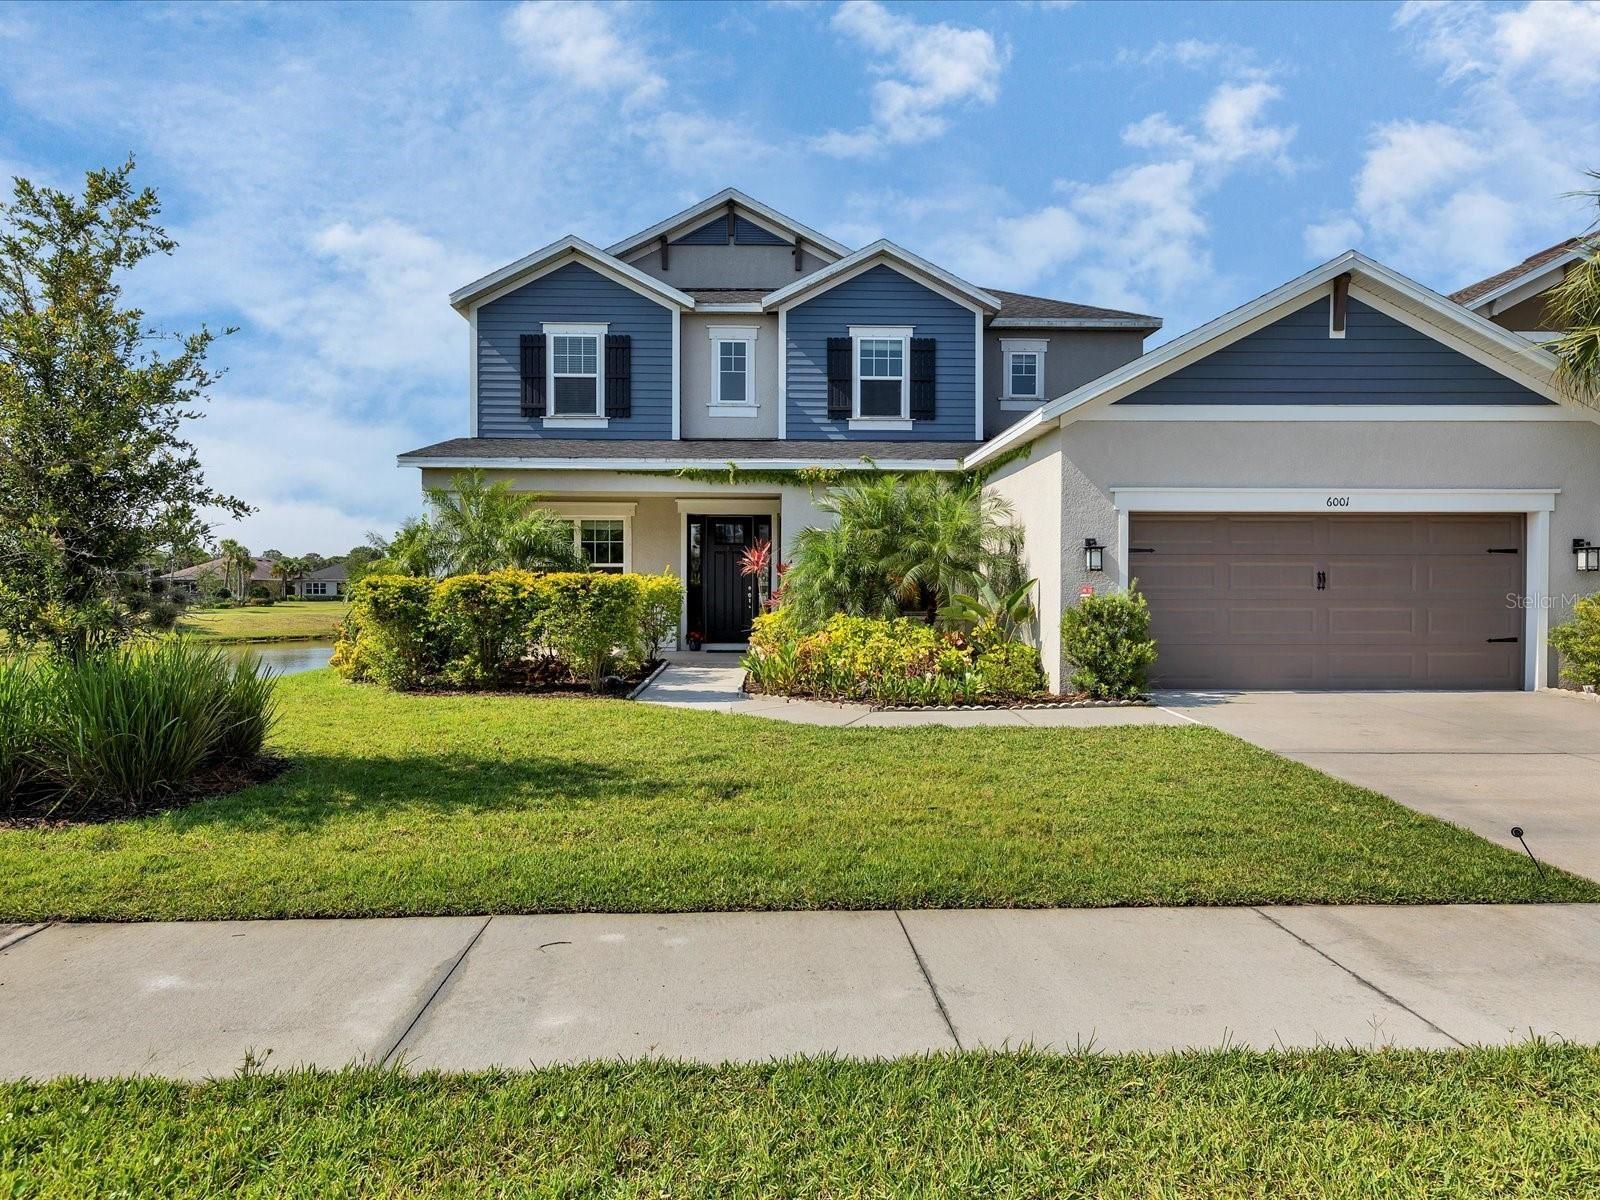 6001 ANISE DRIVE, Sarasota, FL 34238 - #: A4502654